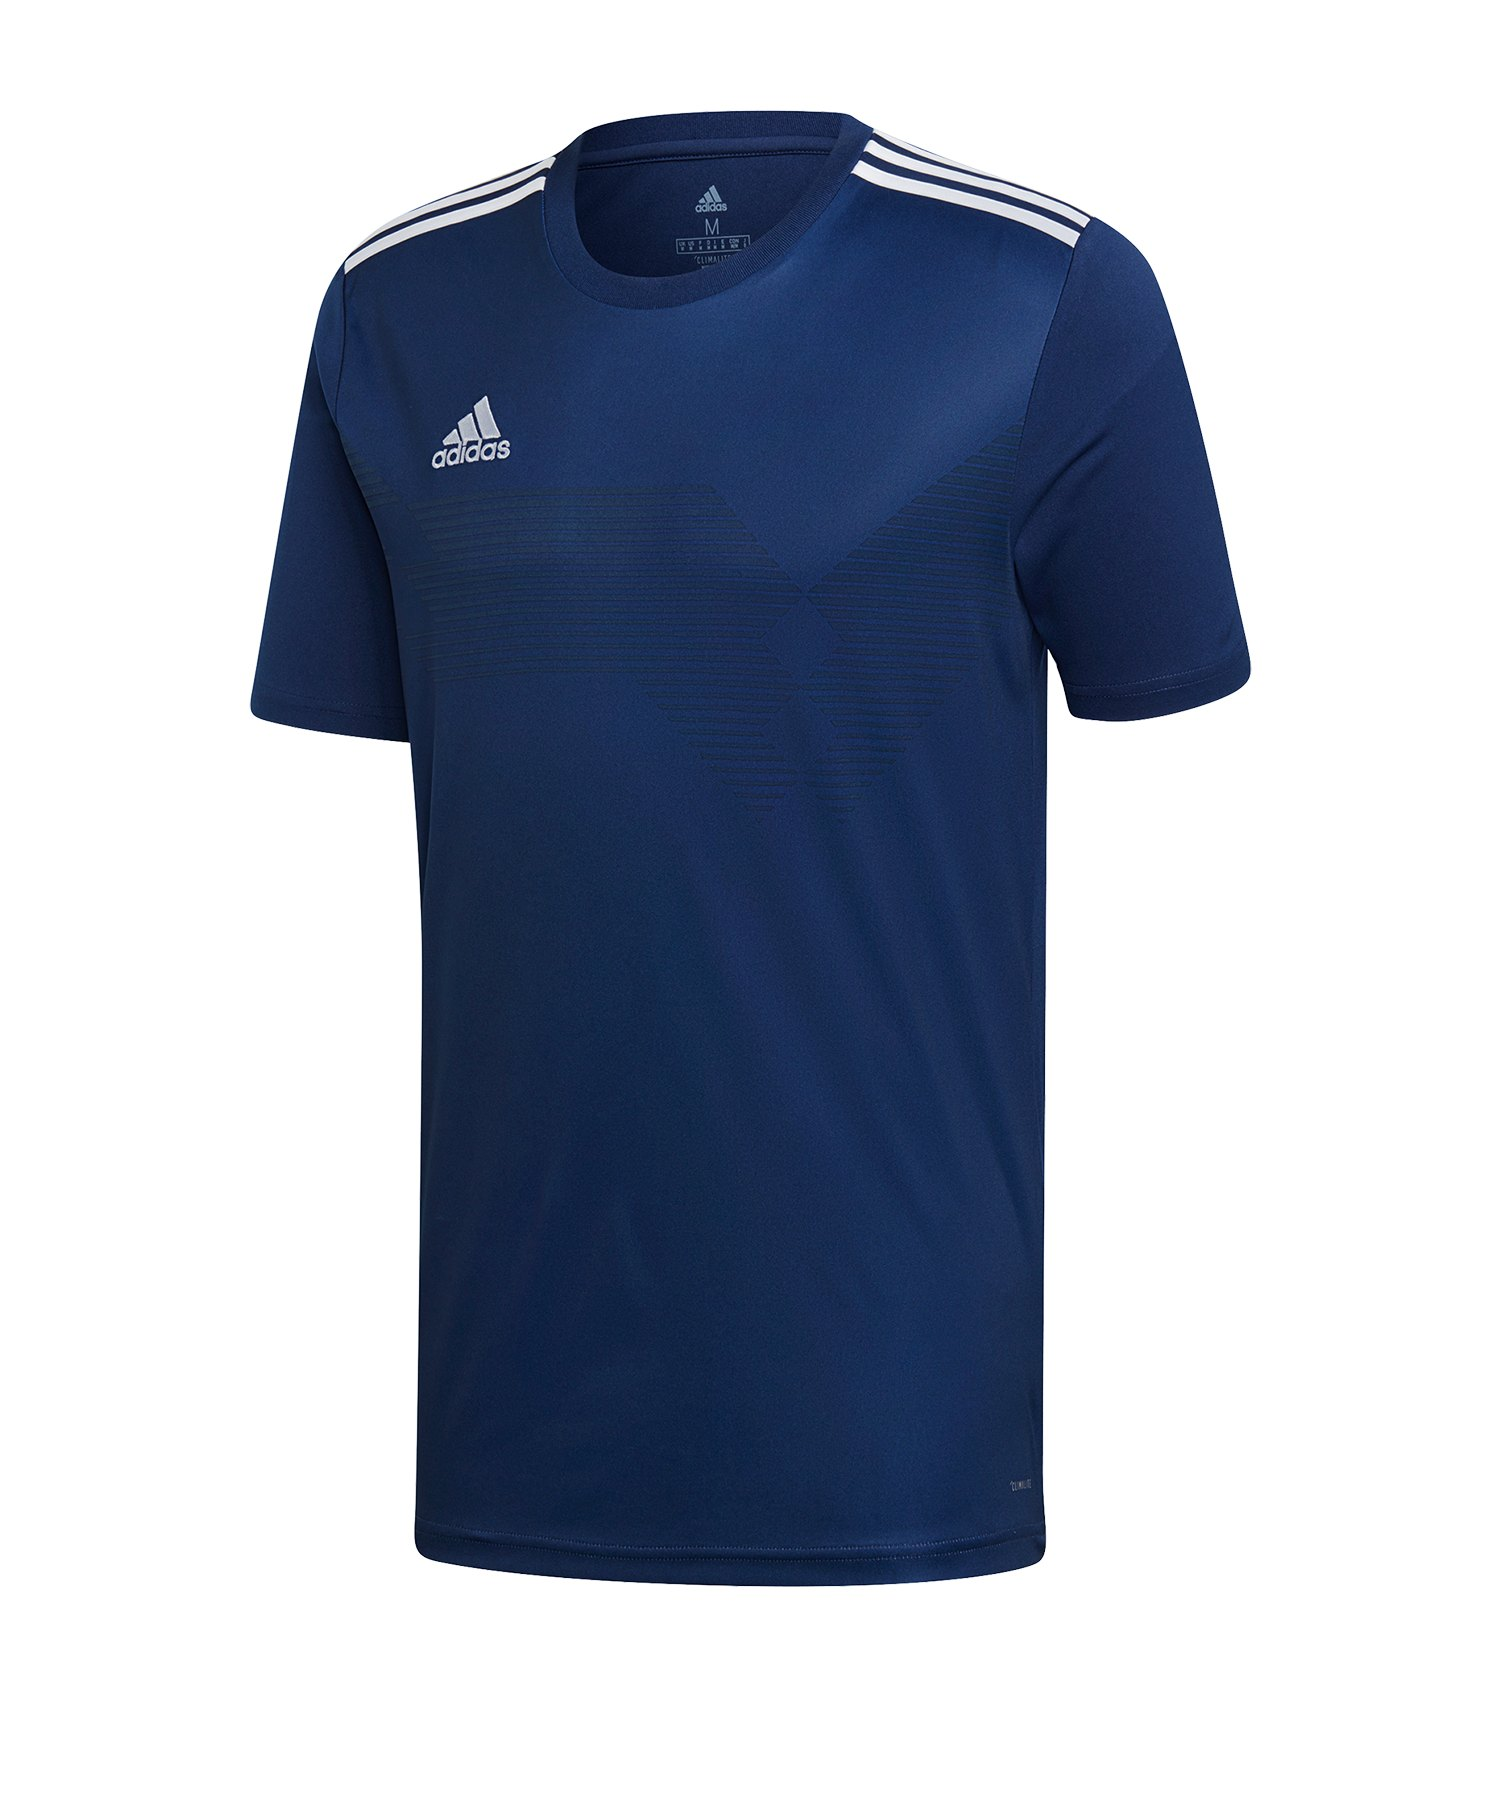 adidas Campeon 19 Trikot Dunkelblau Weiss - blau